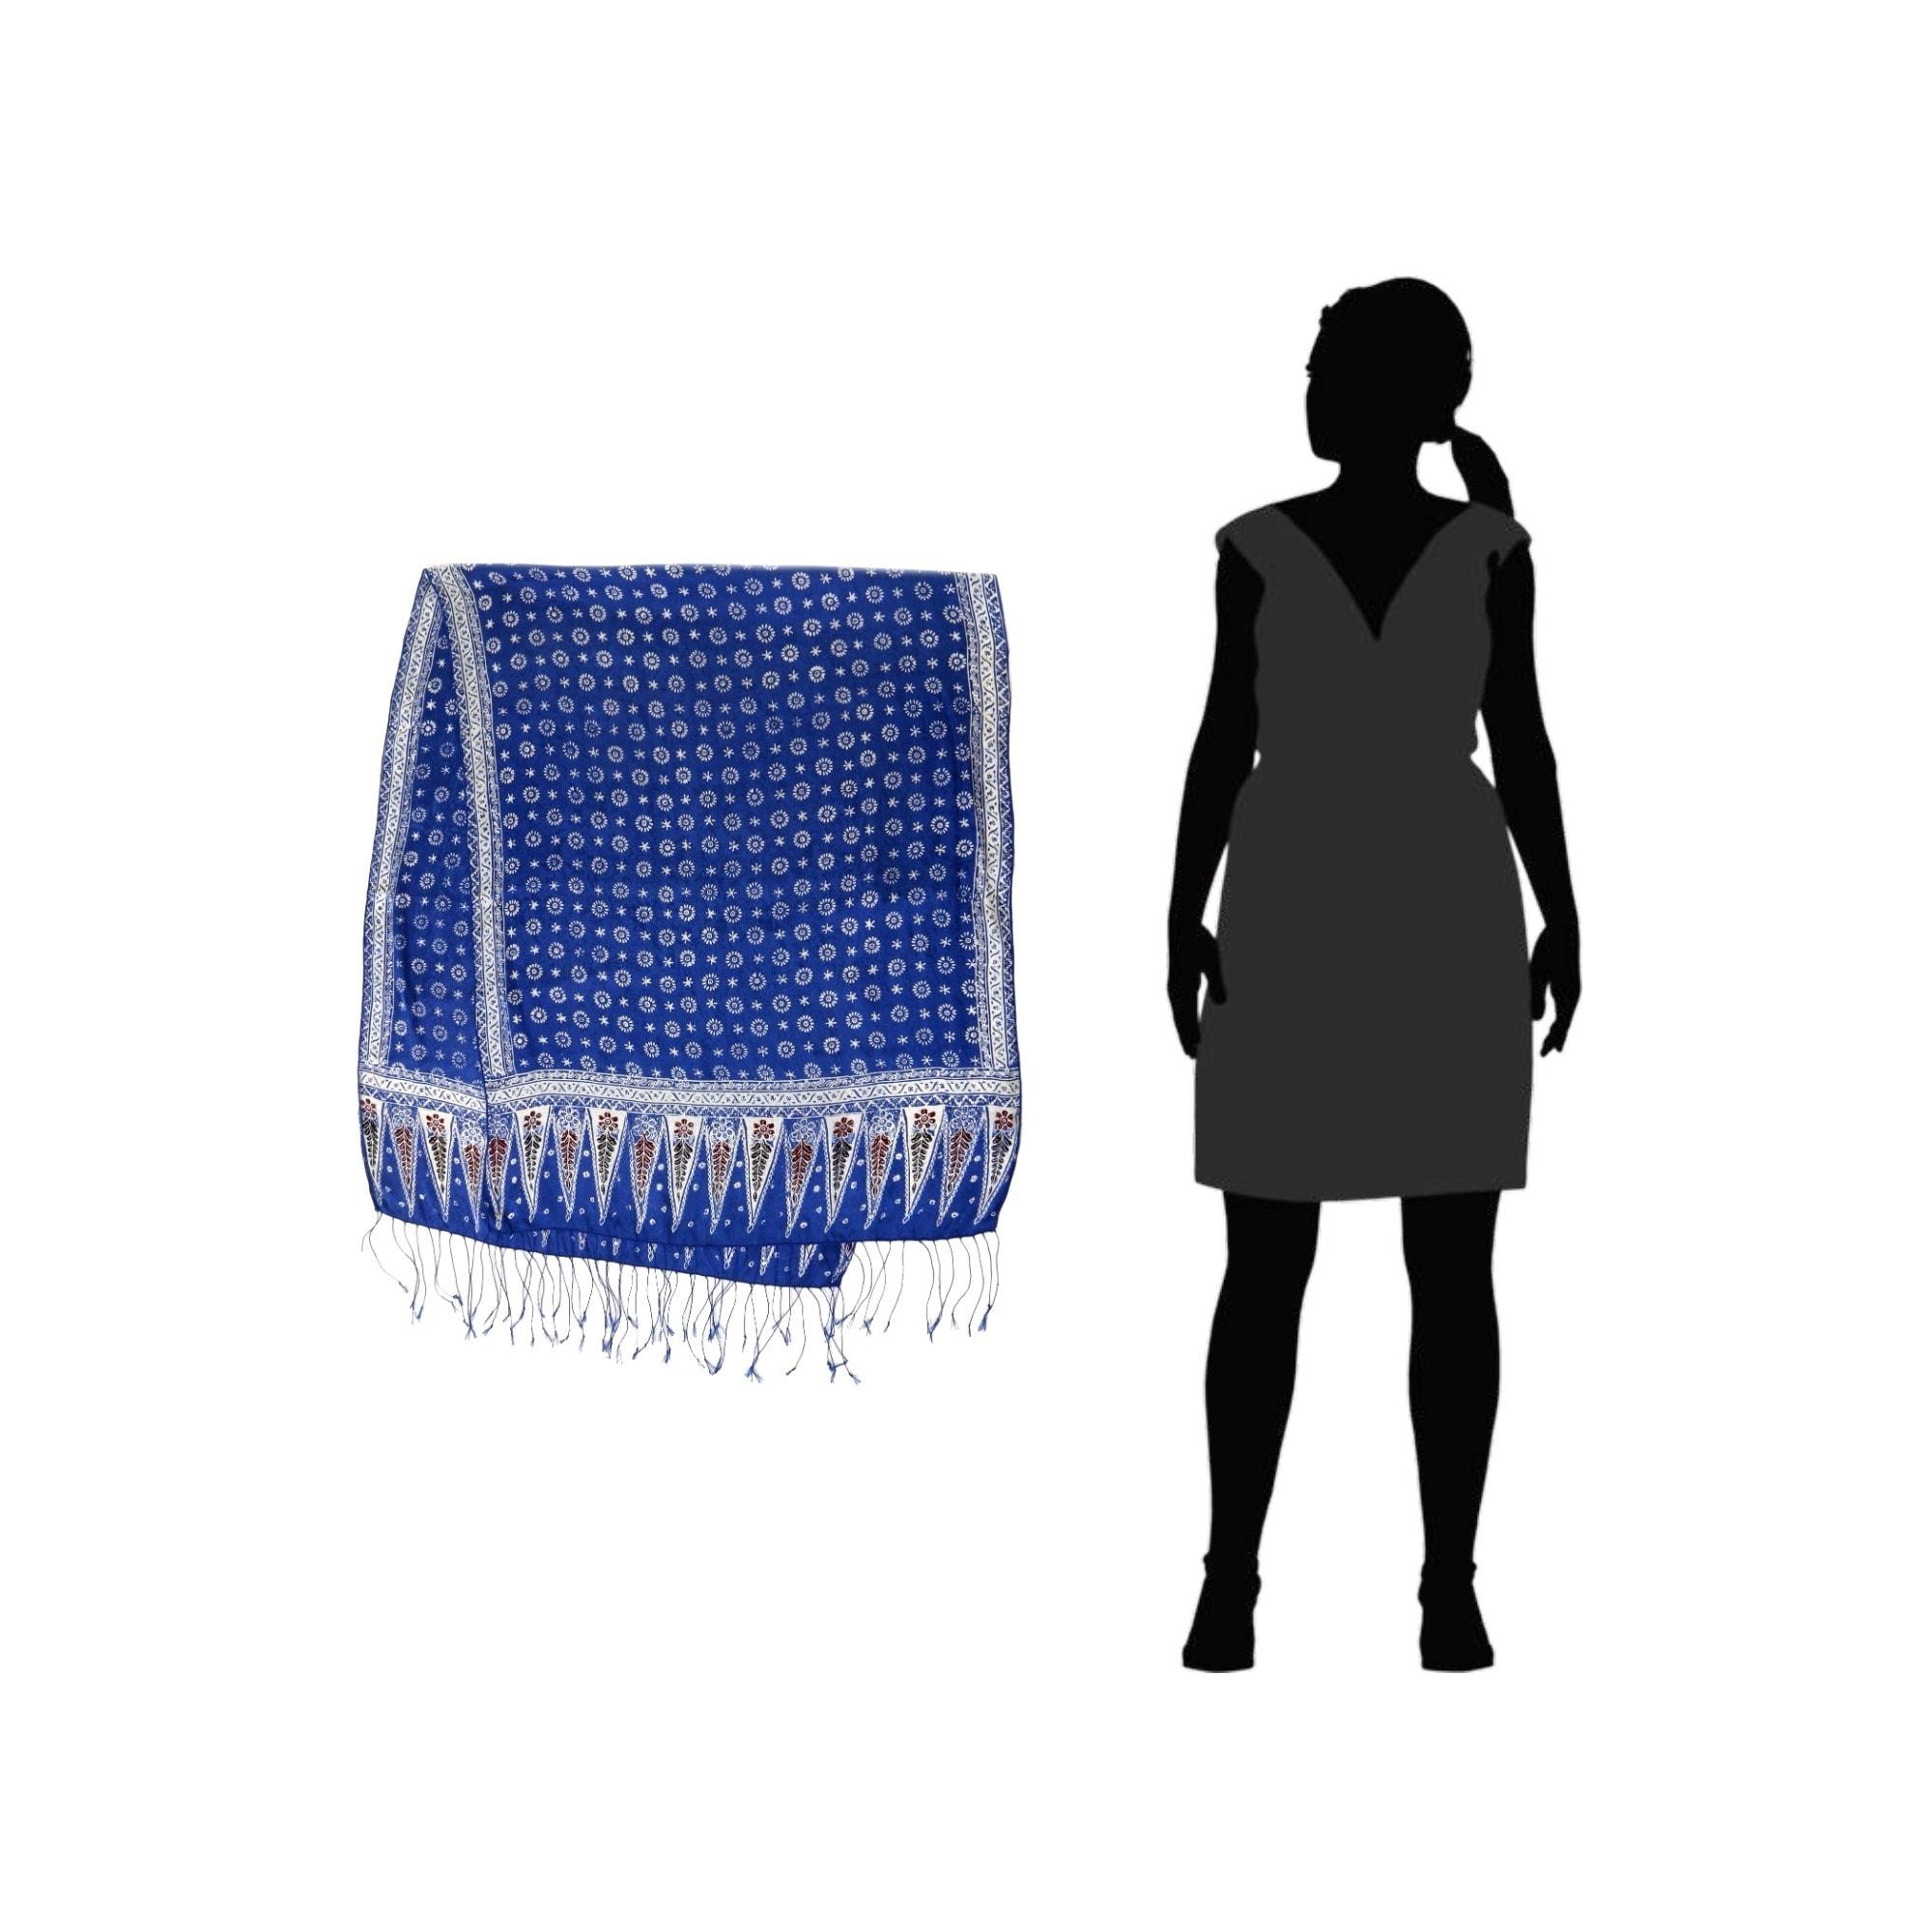 Shop Handmade Silk Awakening Batik Scarf Indonesia On Sale Hoc Store French Cuff Free Shipping Orders Over 45 3318751